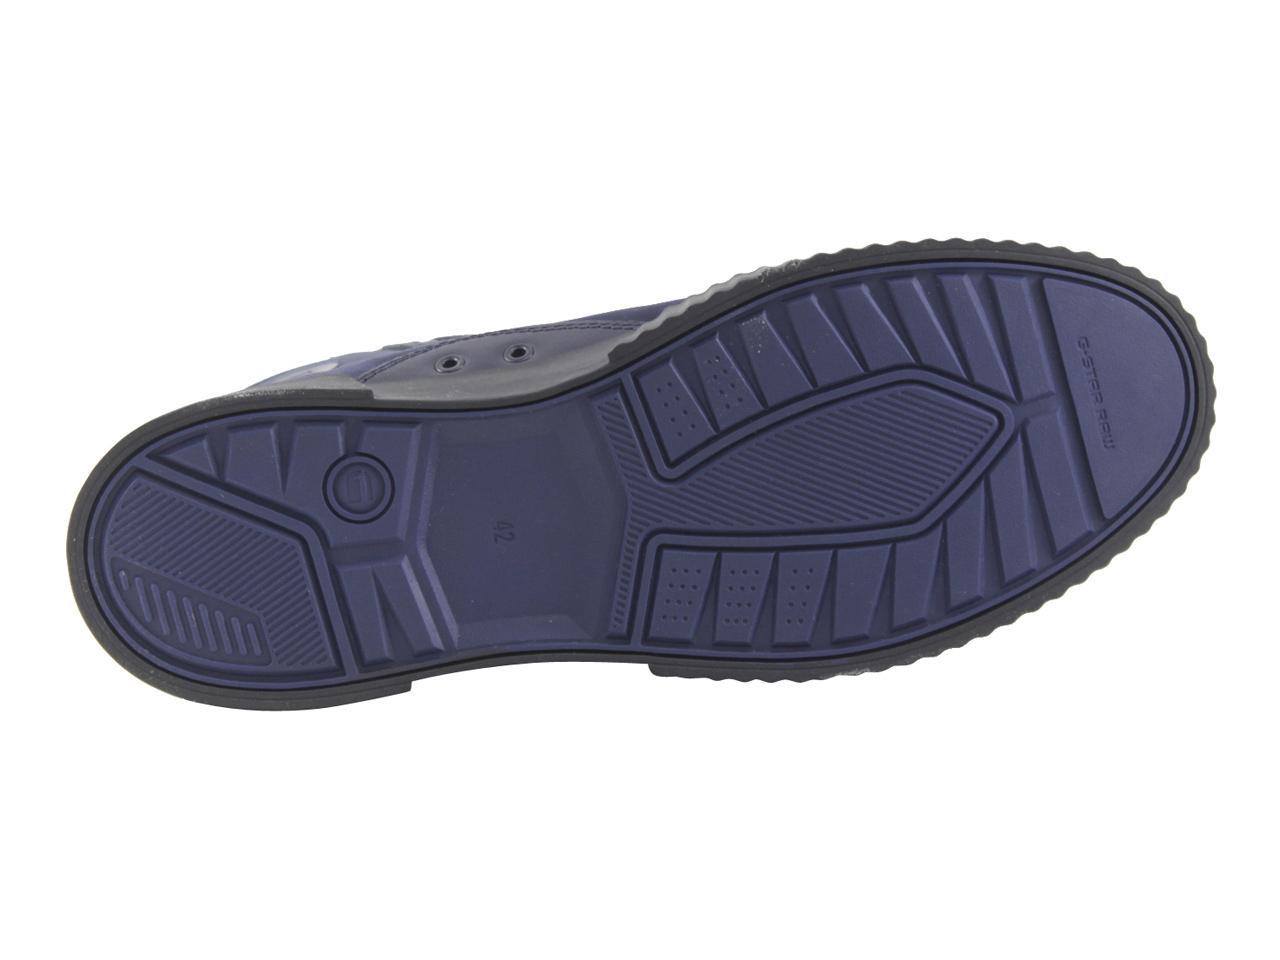 G-Star Raw Men s Rackam-Scuba-High Sneakers Shoes by G-Star Raw f5c49d5efa91e